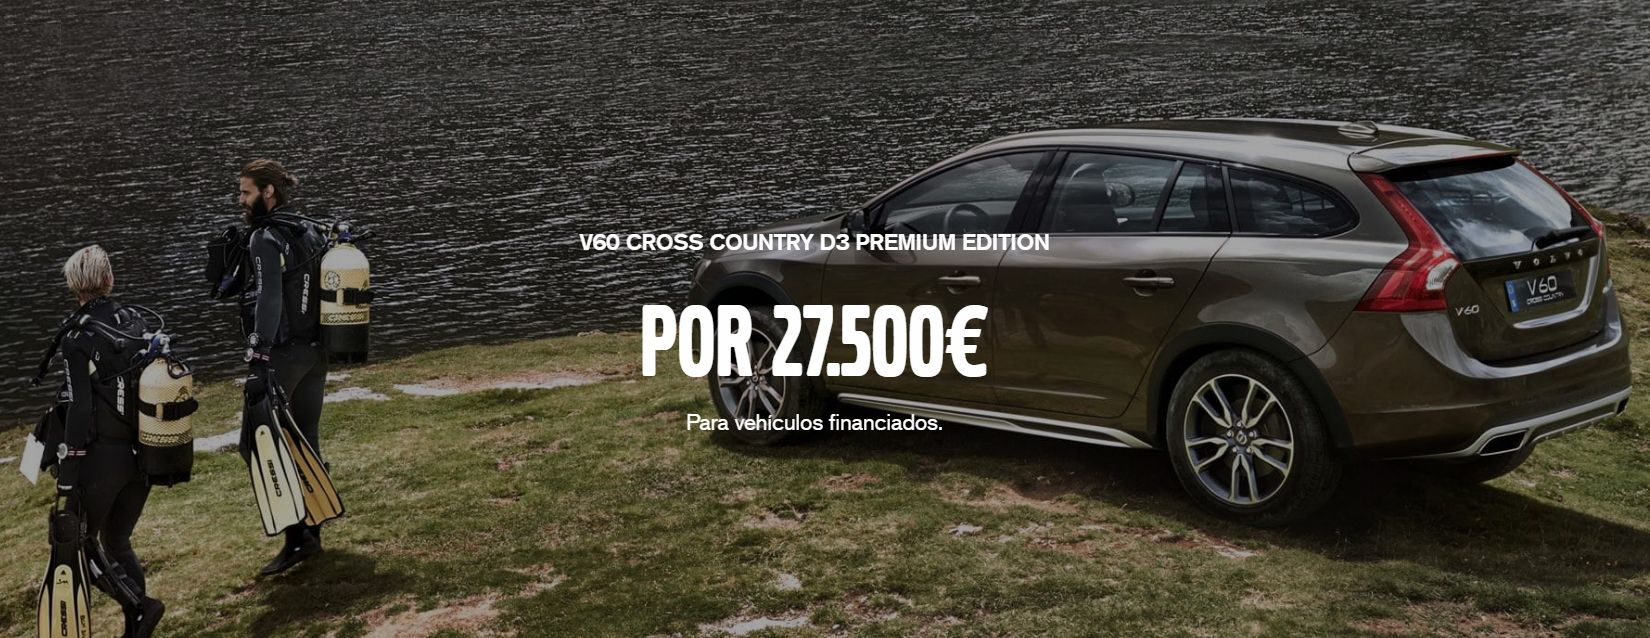 VOLVO V60 CROSS COUNTRY PREMIUM EDITION